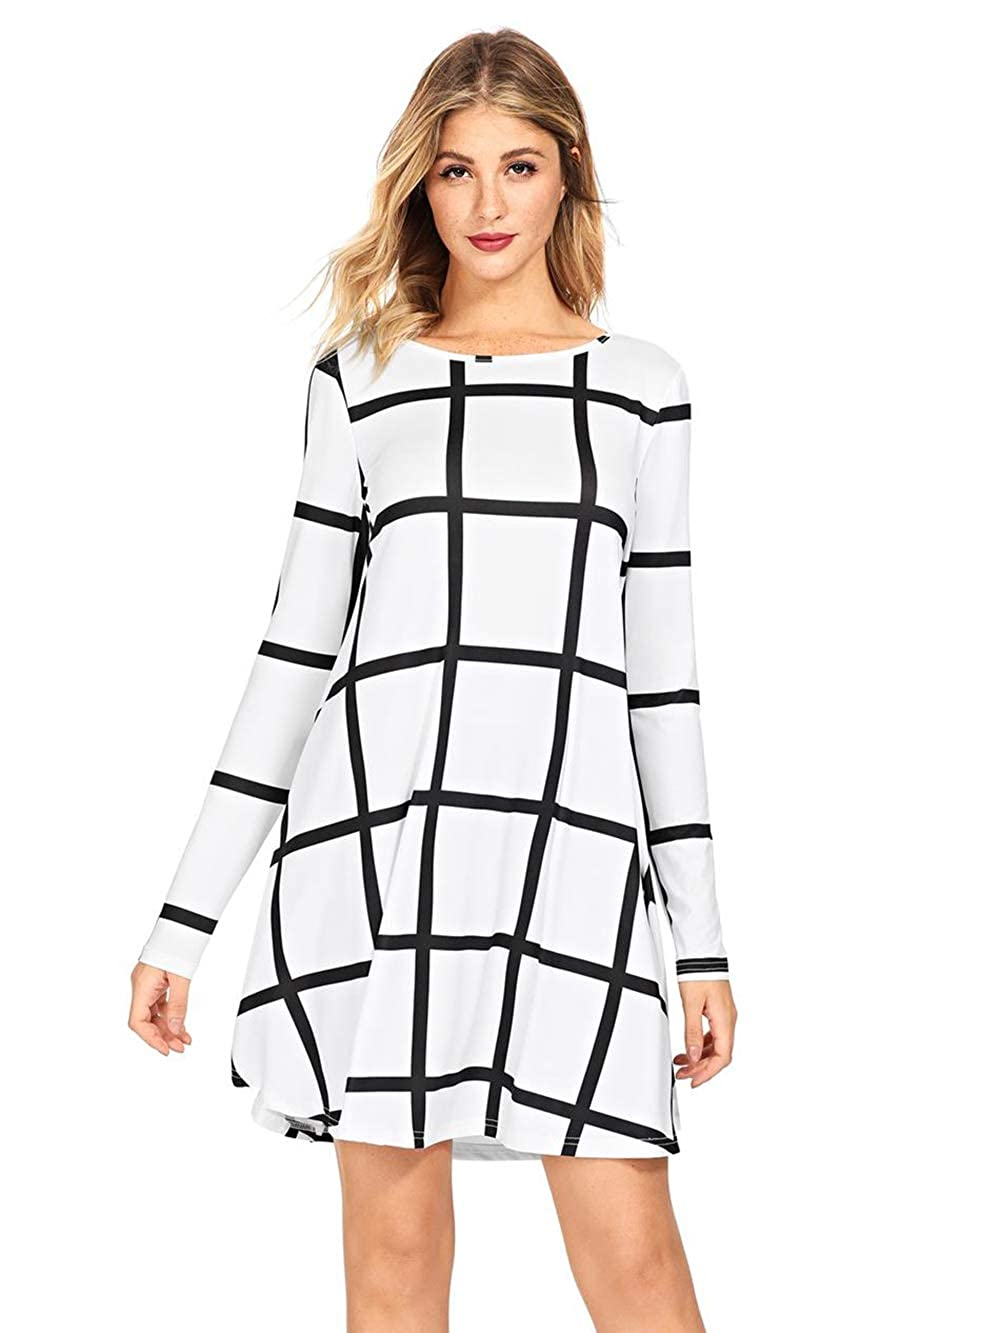 Black   White SheIn Women's Grid Check Print Long Sleeve Swing Dress